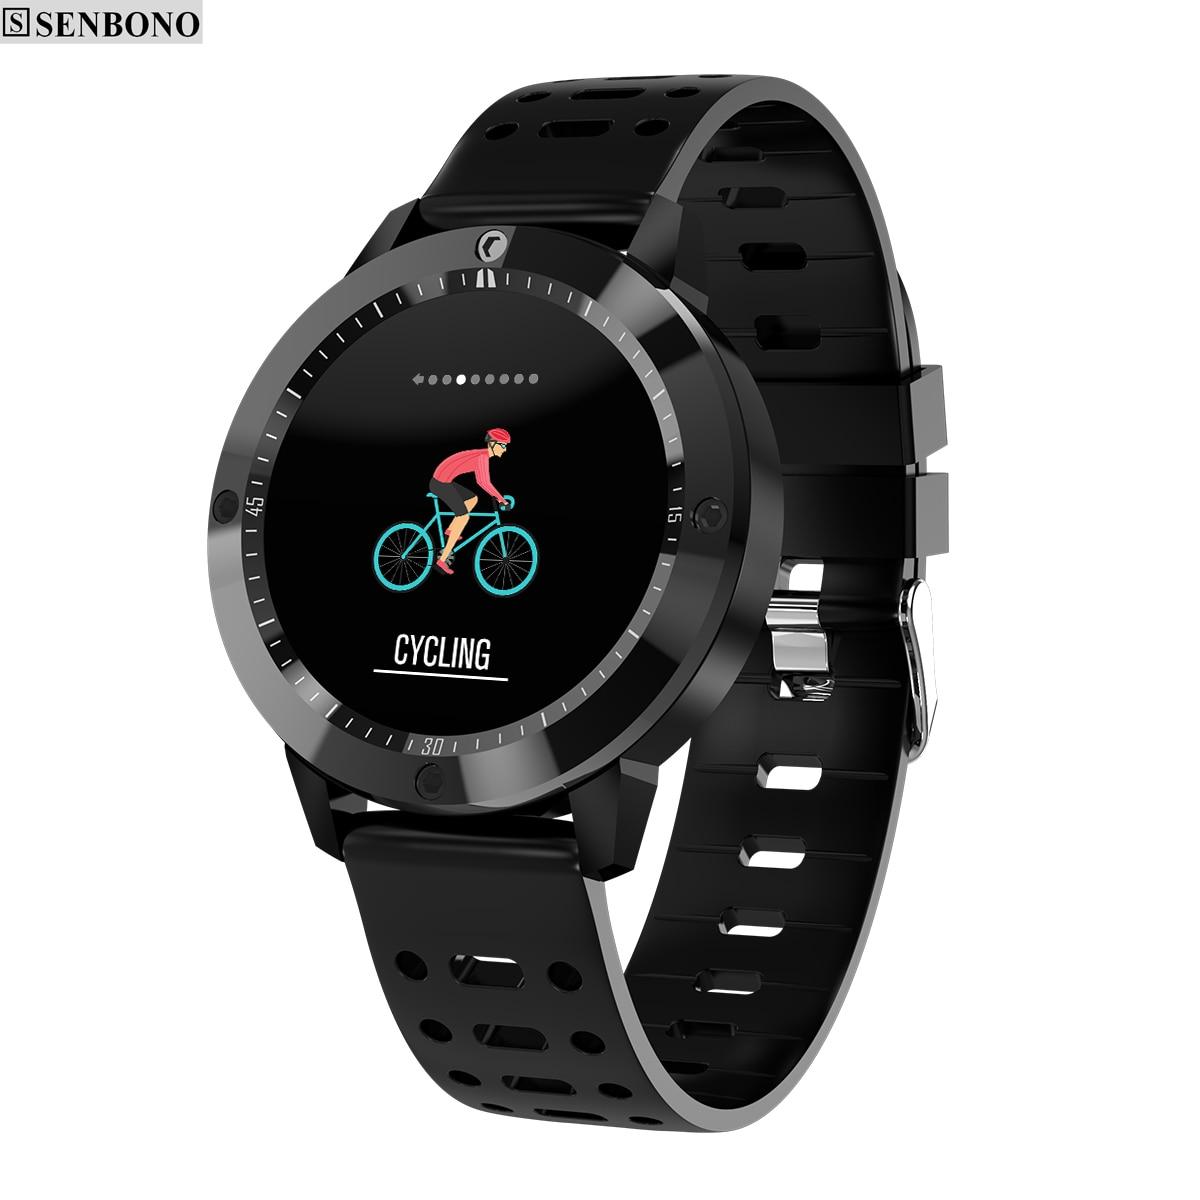 SENBONO CF58 Smart watch IP67 waterproof Tempered glass Activity Fitness tracker Heart rate monitor Sports Men women smartwatch Умные часы